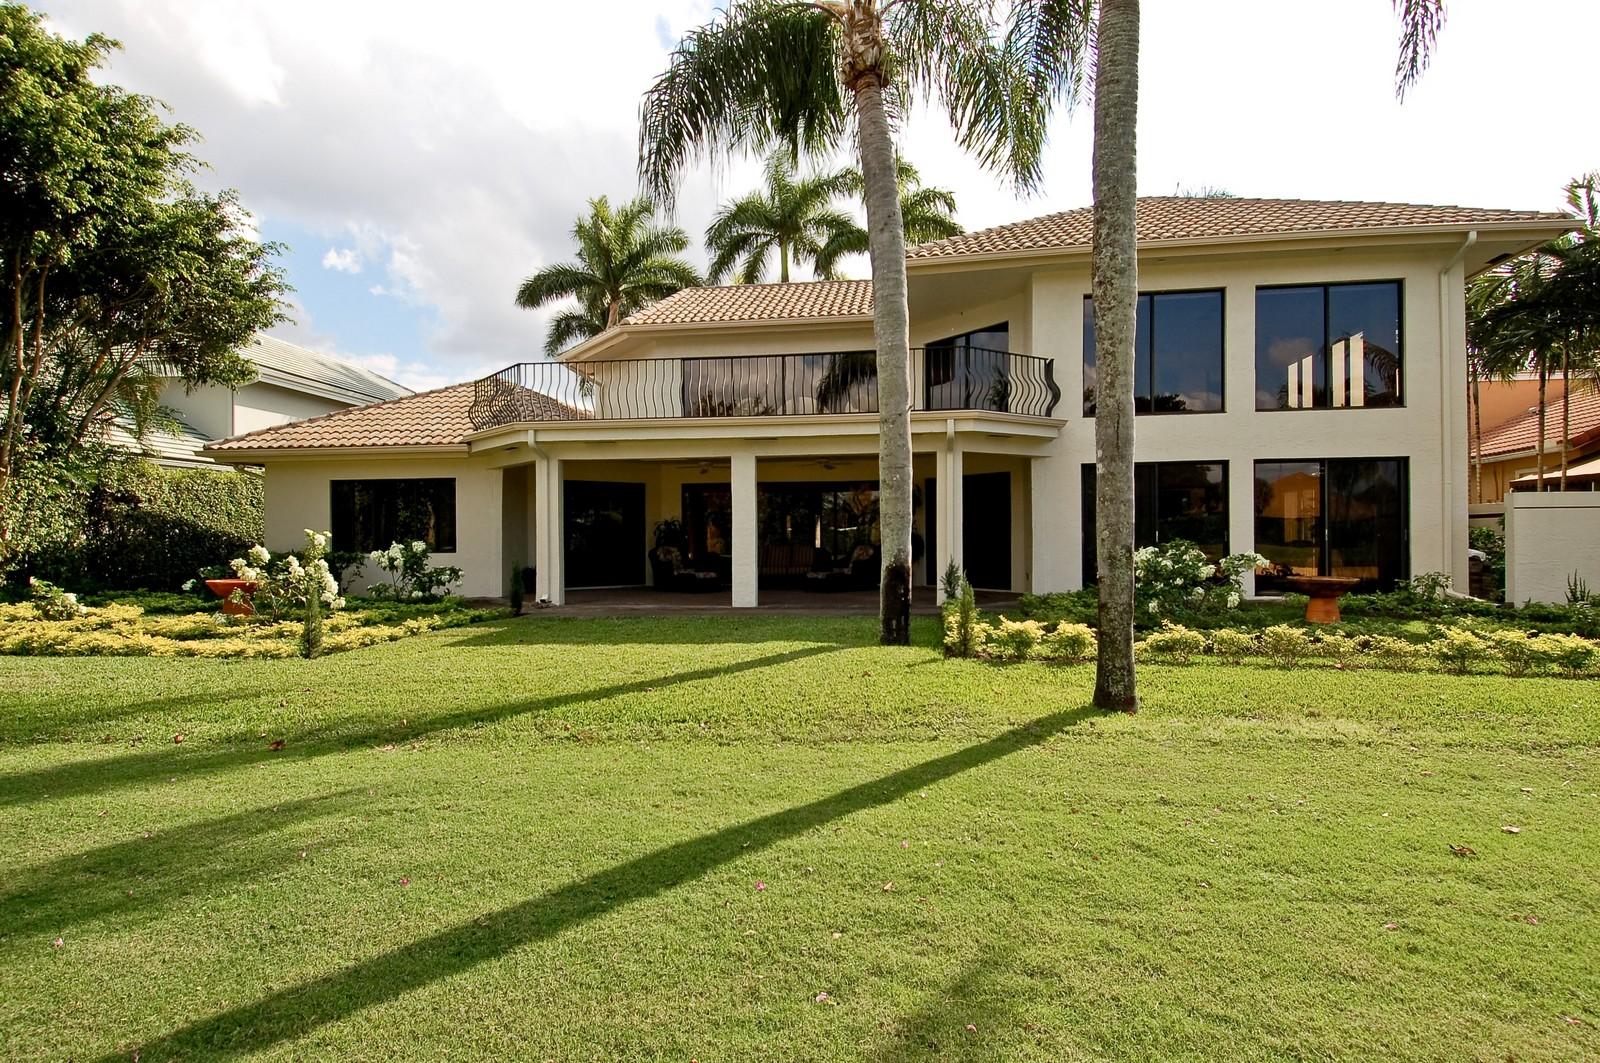 Real Estate Photography - 7339 Mandarin, Boca Raton, FL, 33433 - Rear View